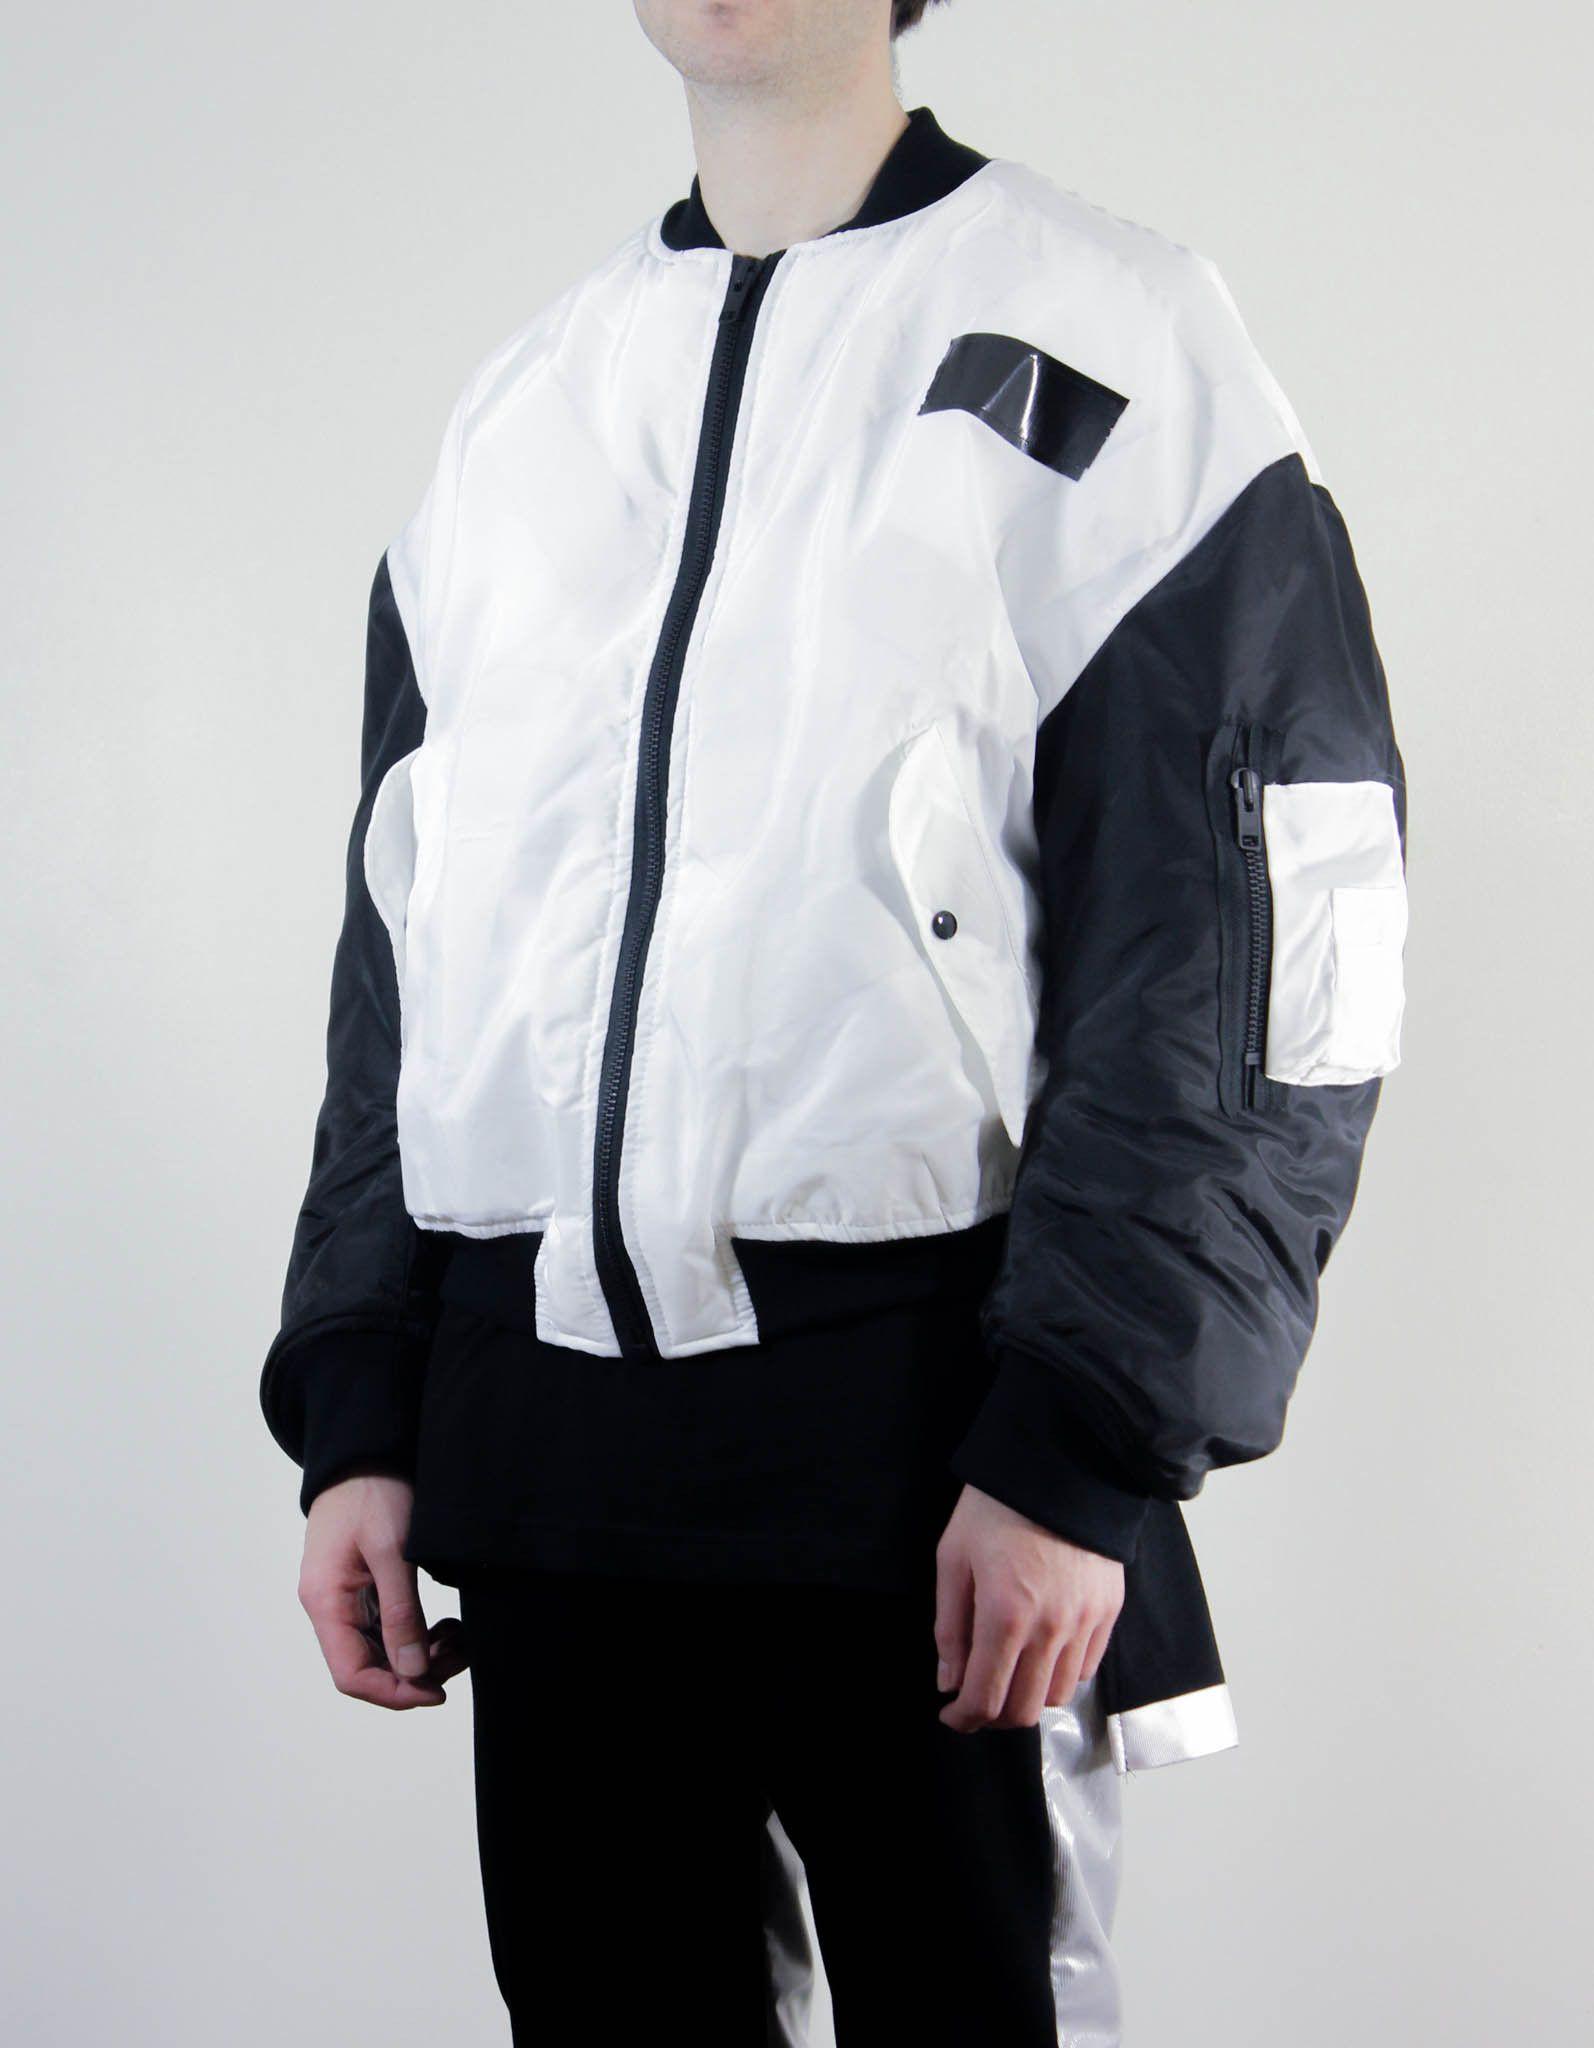 Primitive Menswear: AW13 Collection